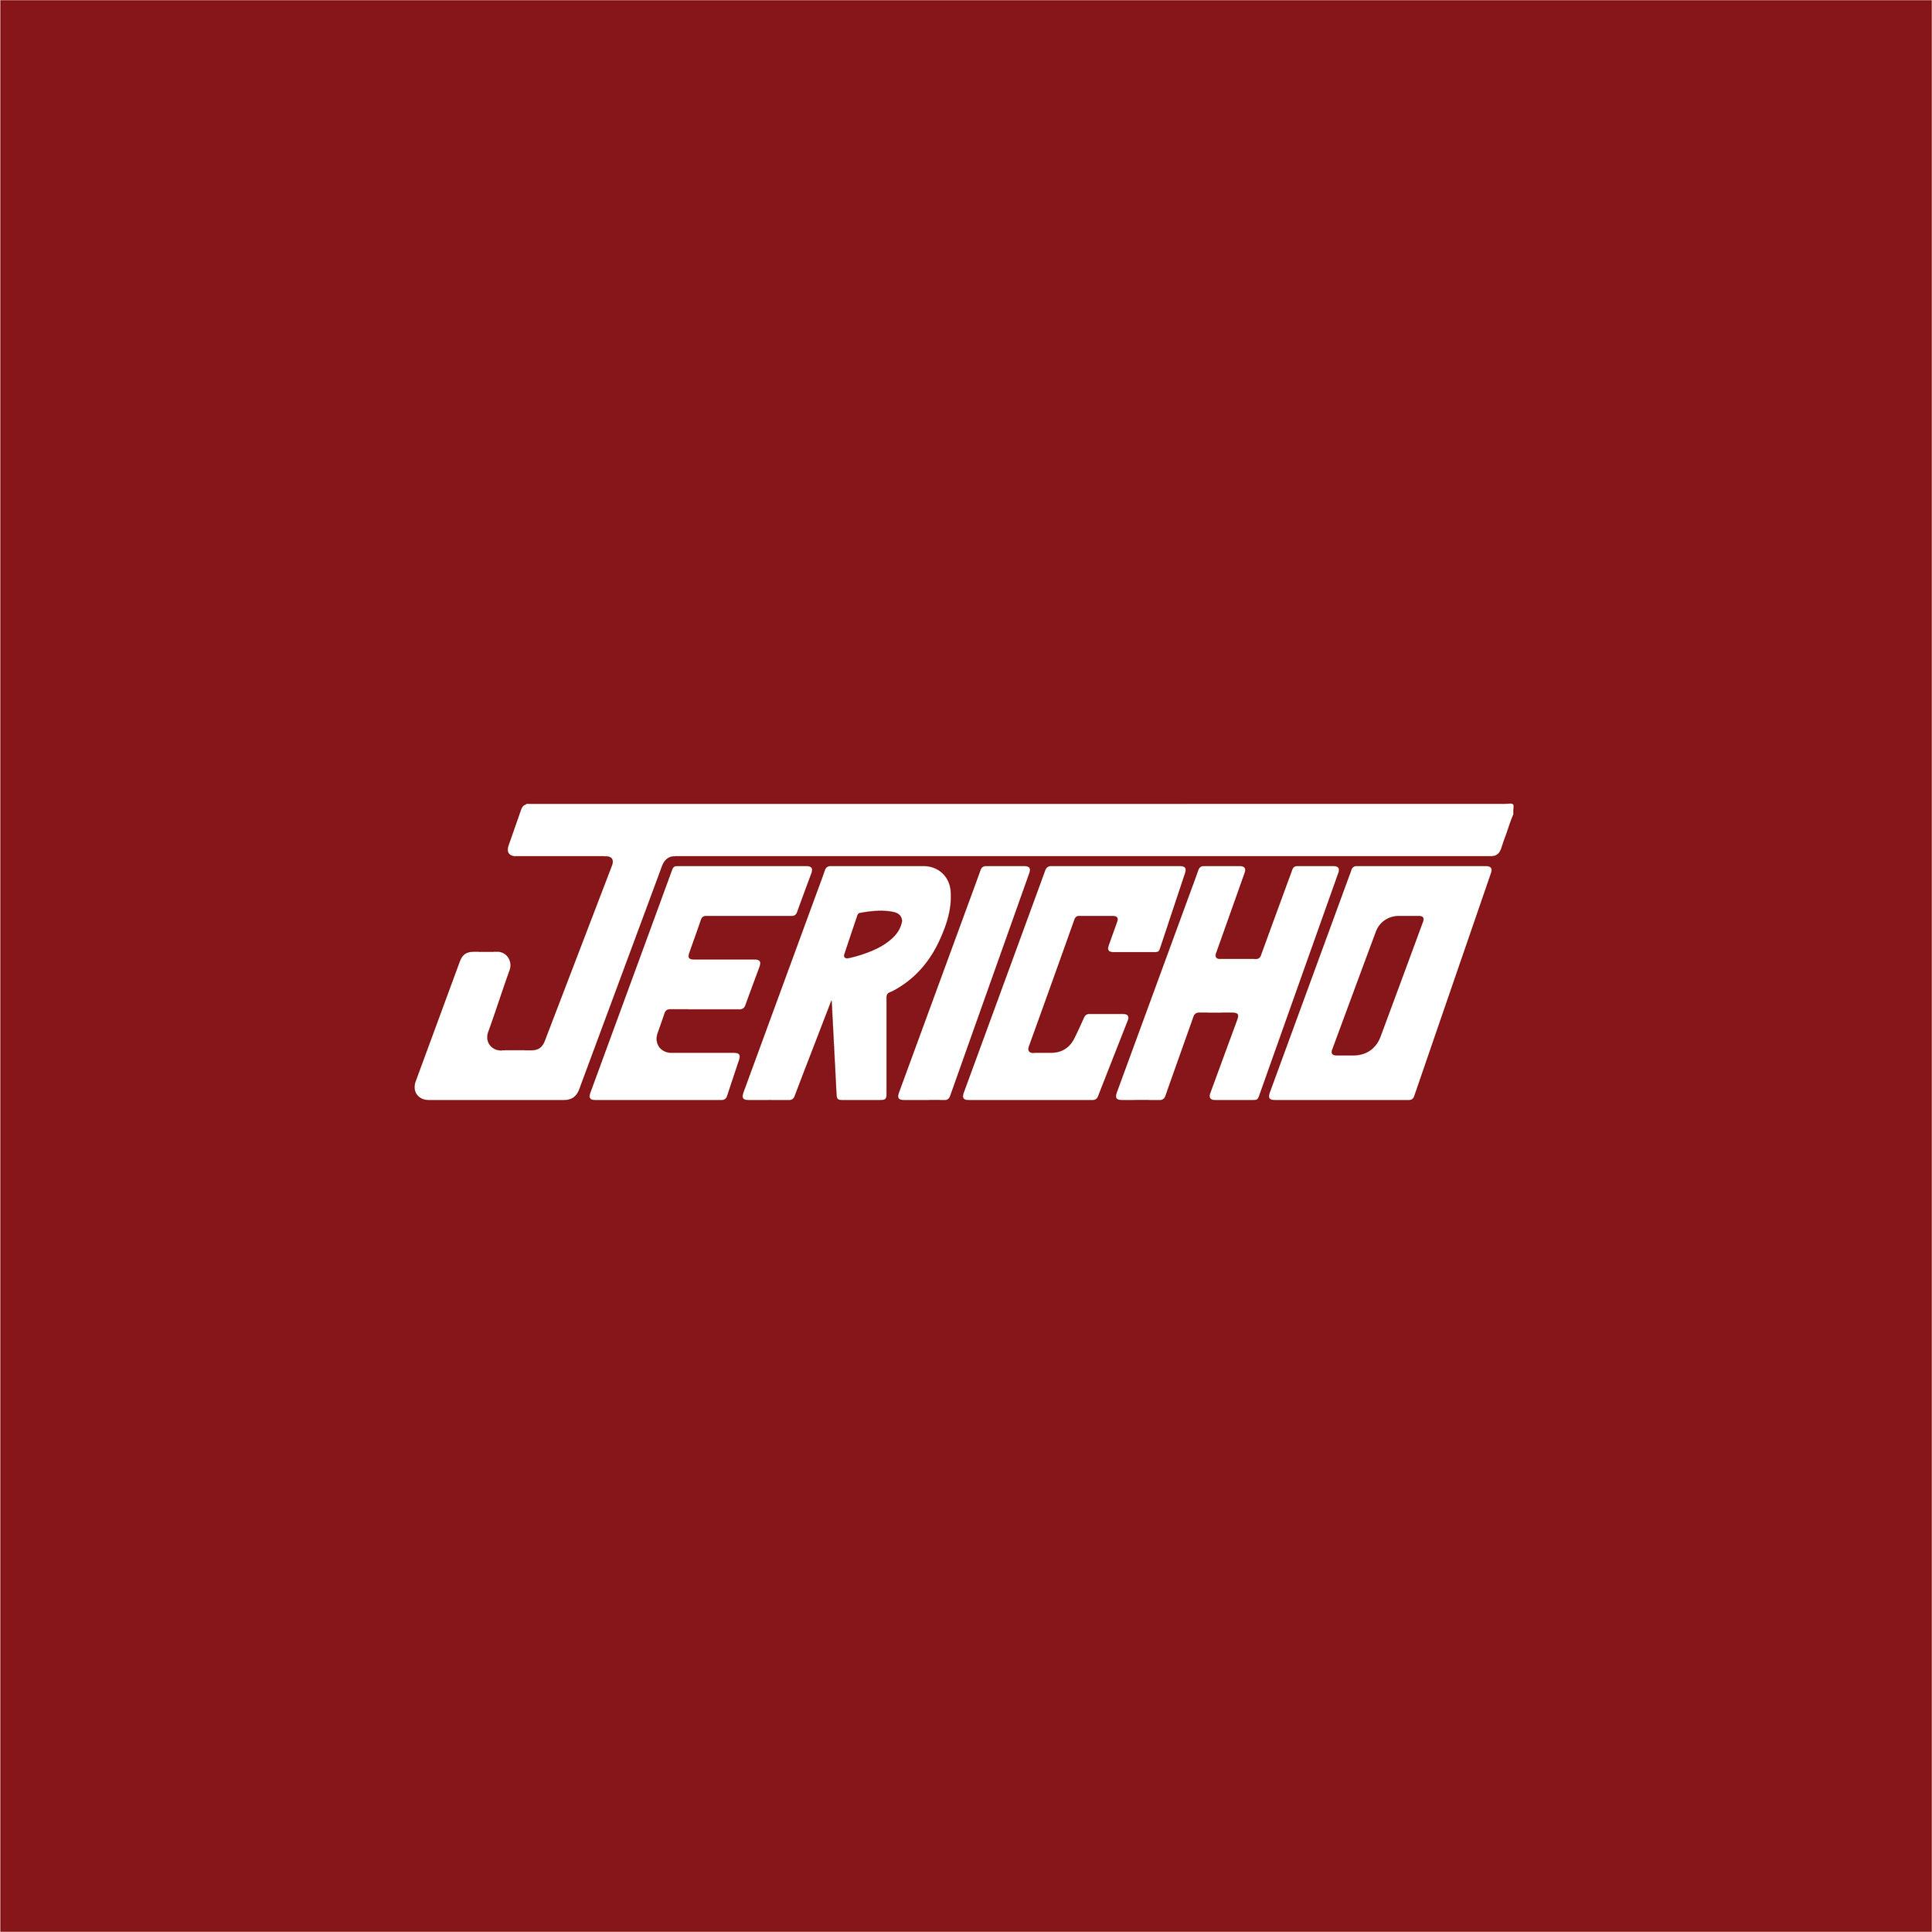 Logo Designs-07.jpg